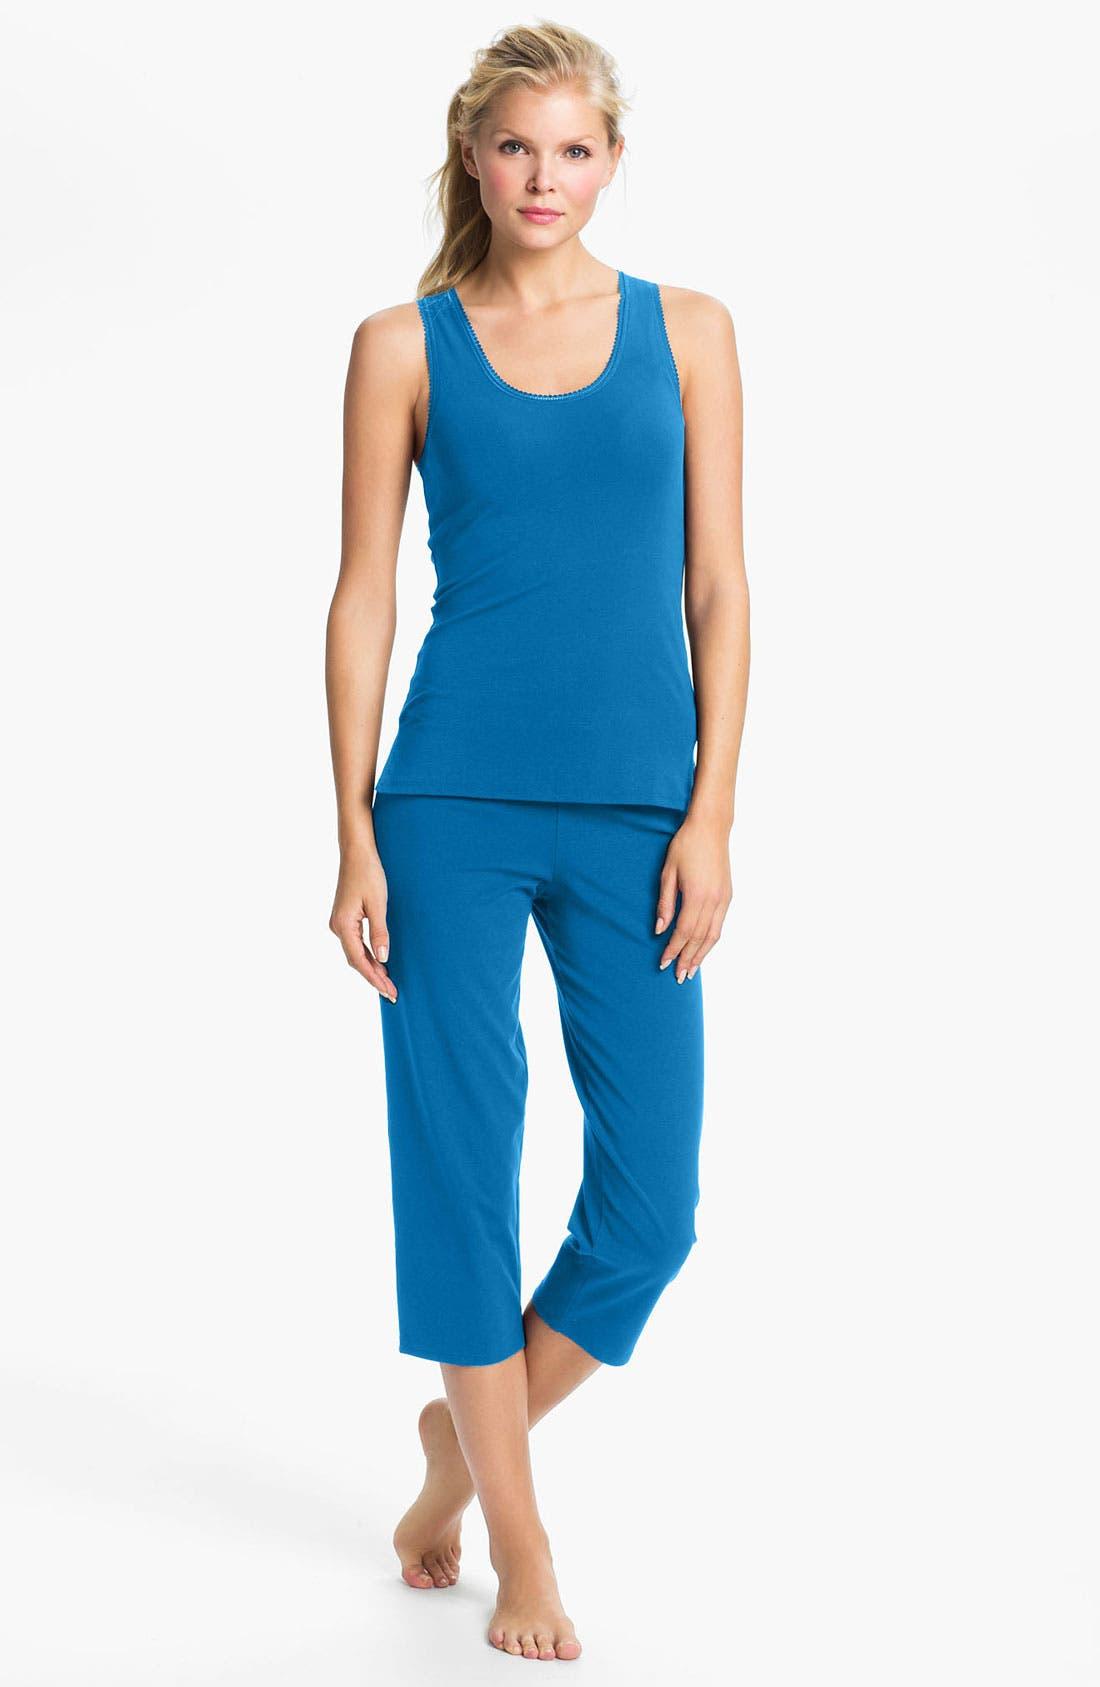 Alternate Image 1 Selected - On Gossamer 'Cabana' Cotton Capri Pajamas